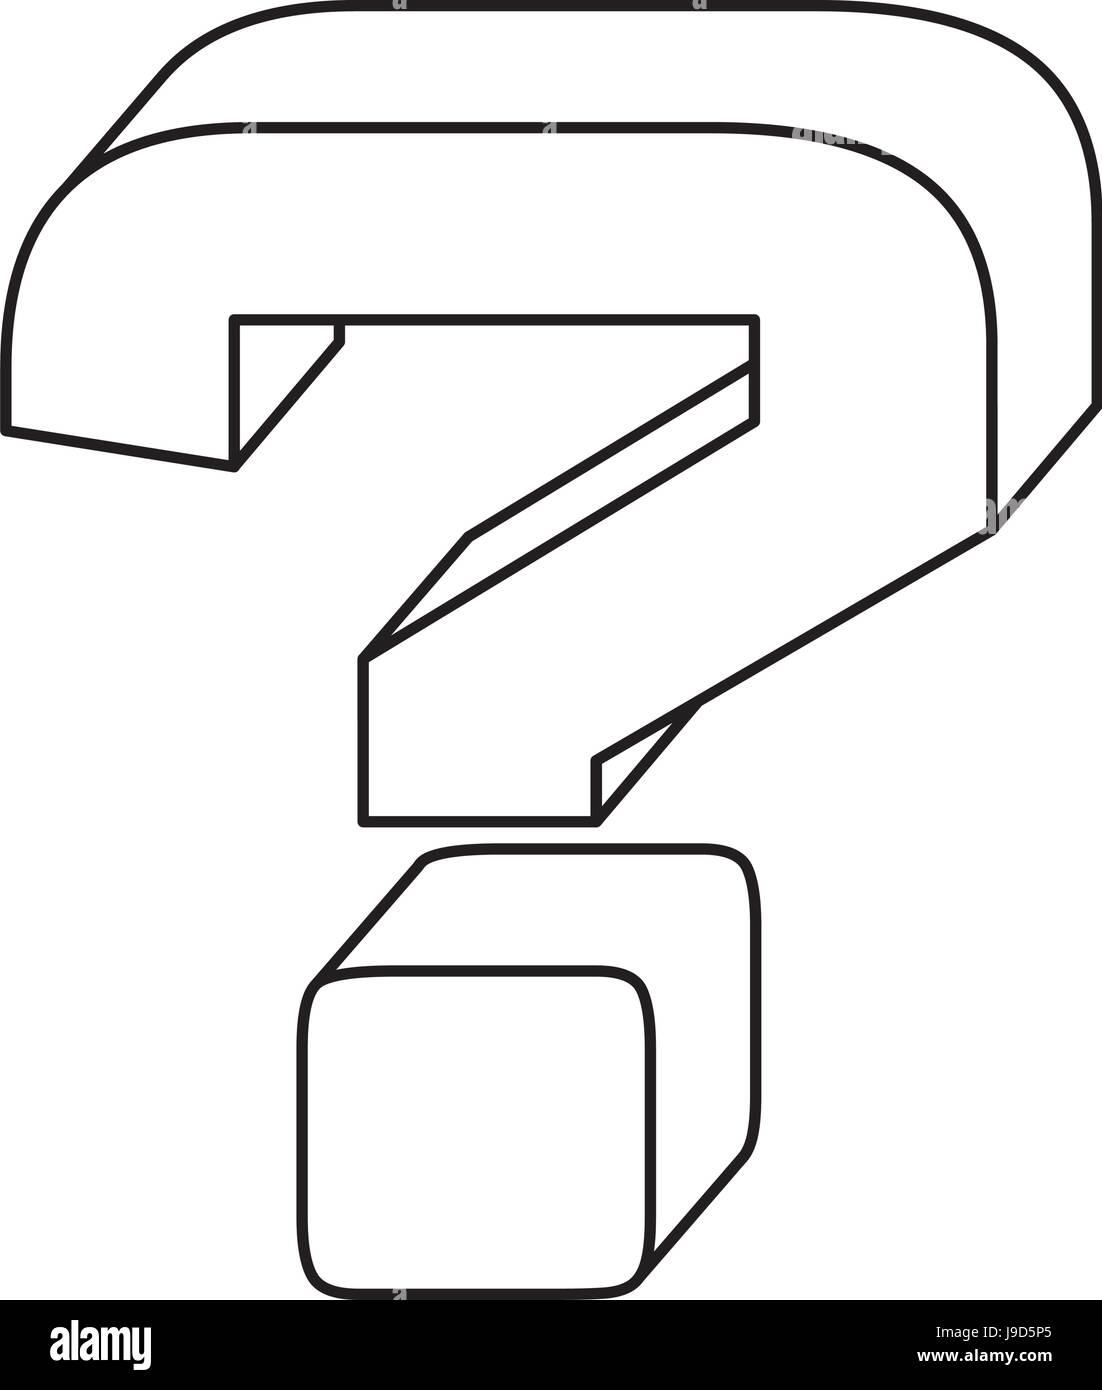 Question mark symbol - Stock Image